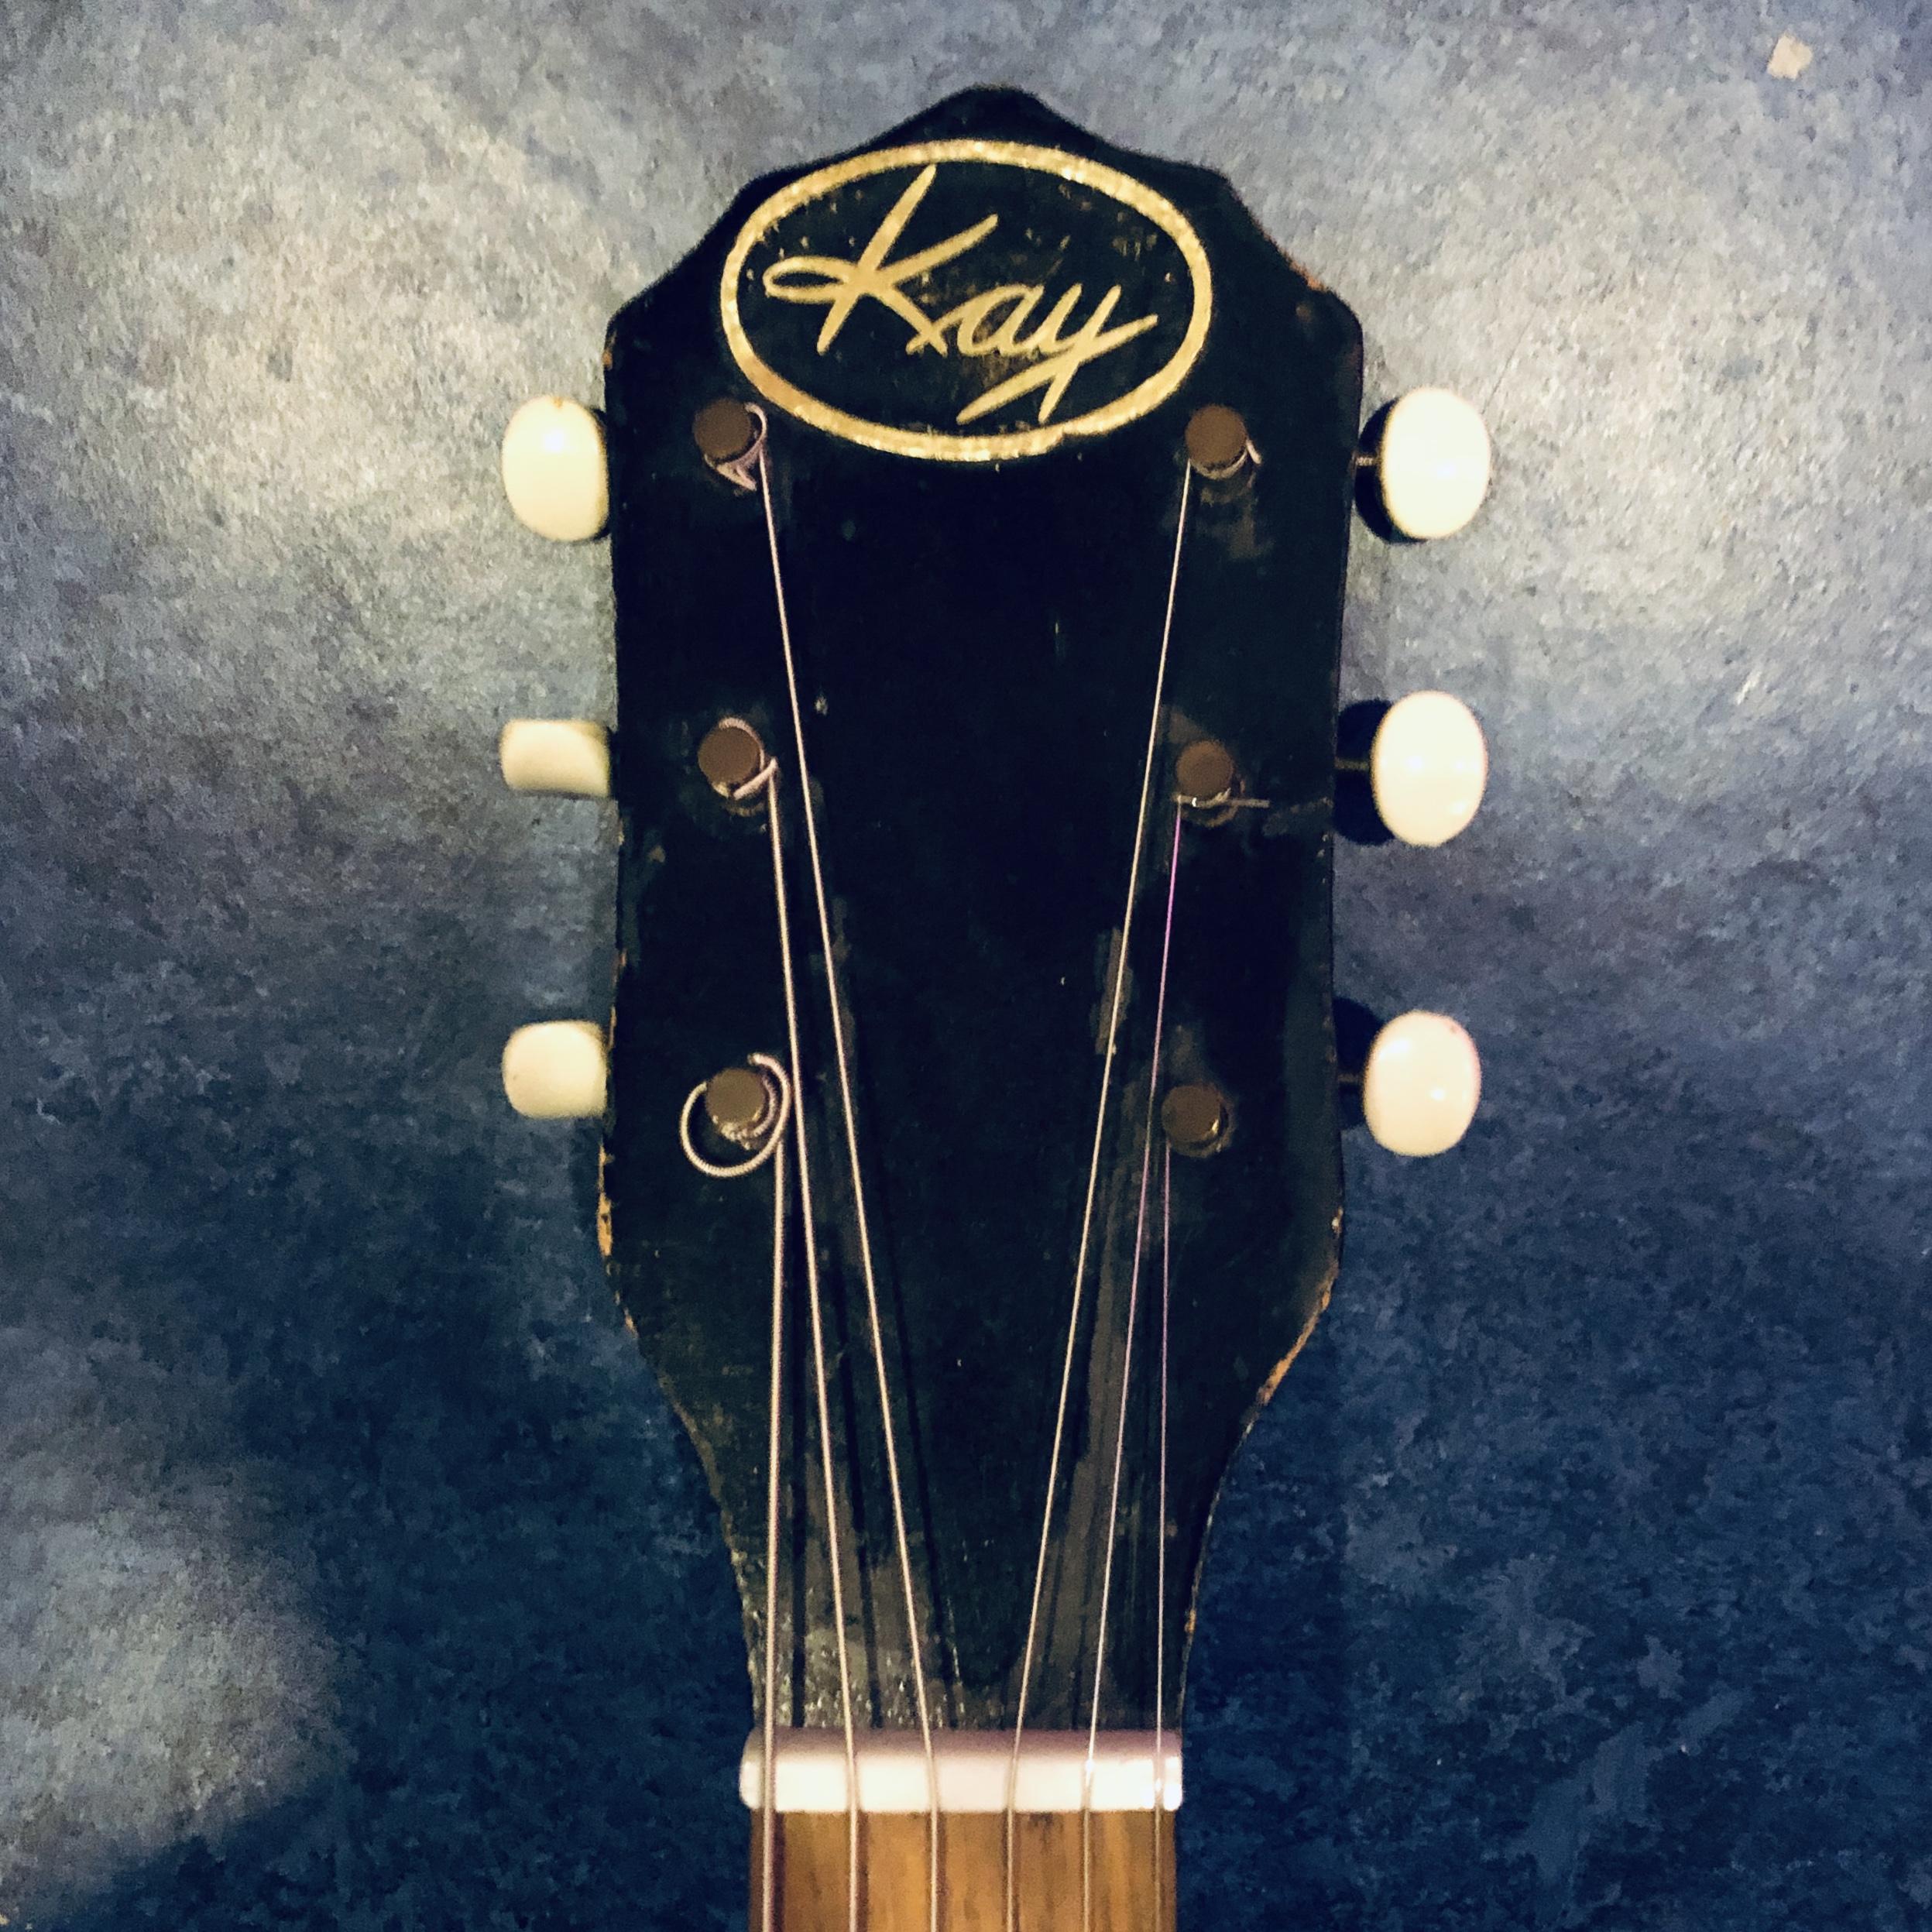 kay-guitar-headstock.jpg